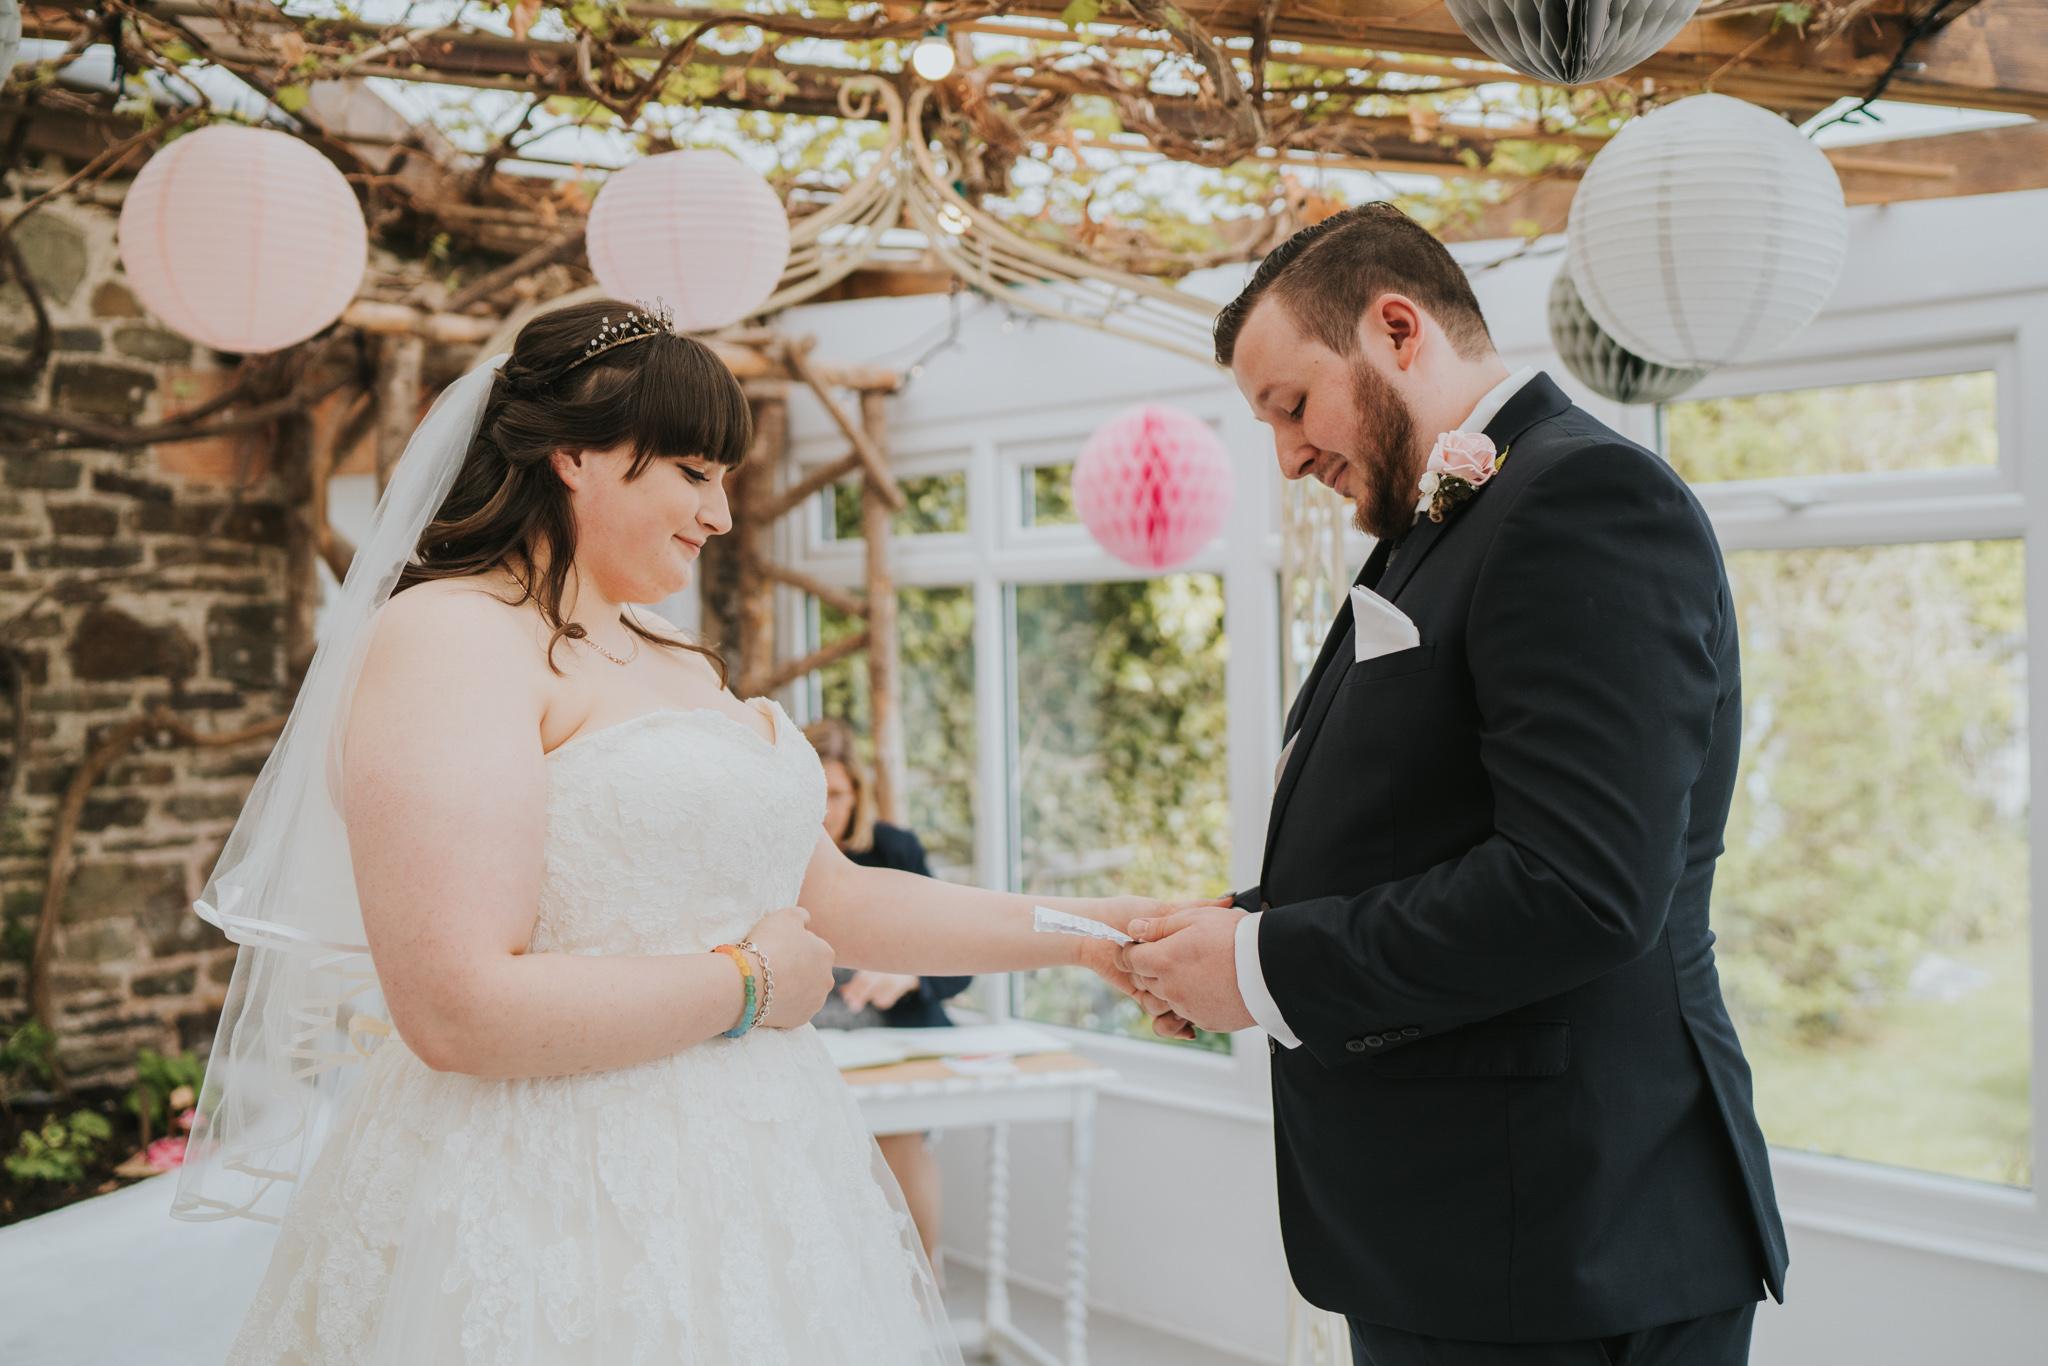 grace-sam-old-barn-clovelly-devon-wedding-photographer-grace-elizabeth-essex-suffolk-norfolk-wedding-photographer (58 of 132).jpg